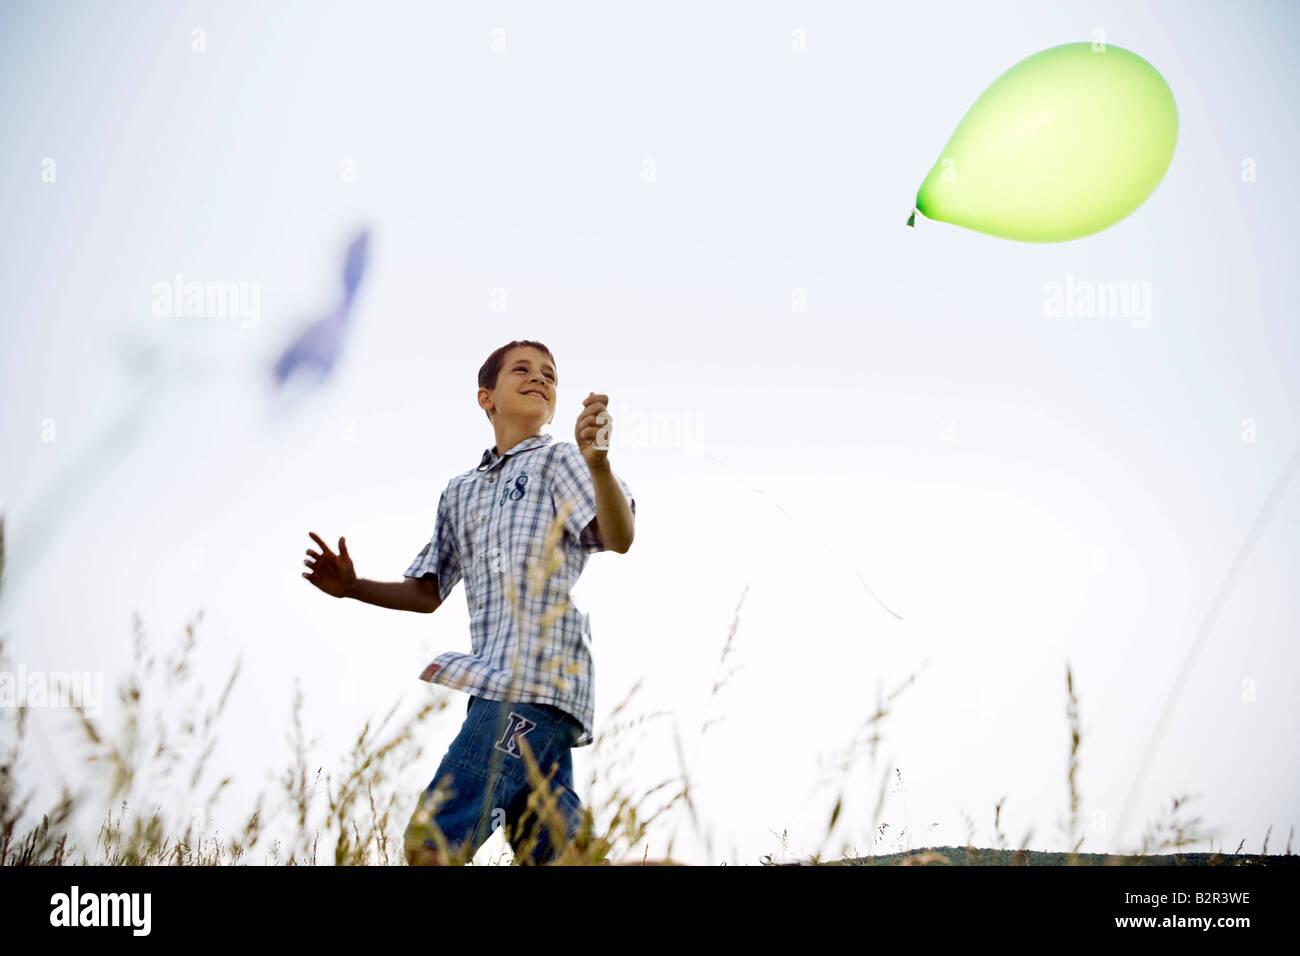 Boy running with balloon - Stock Image